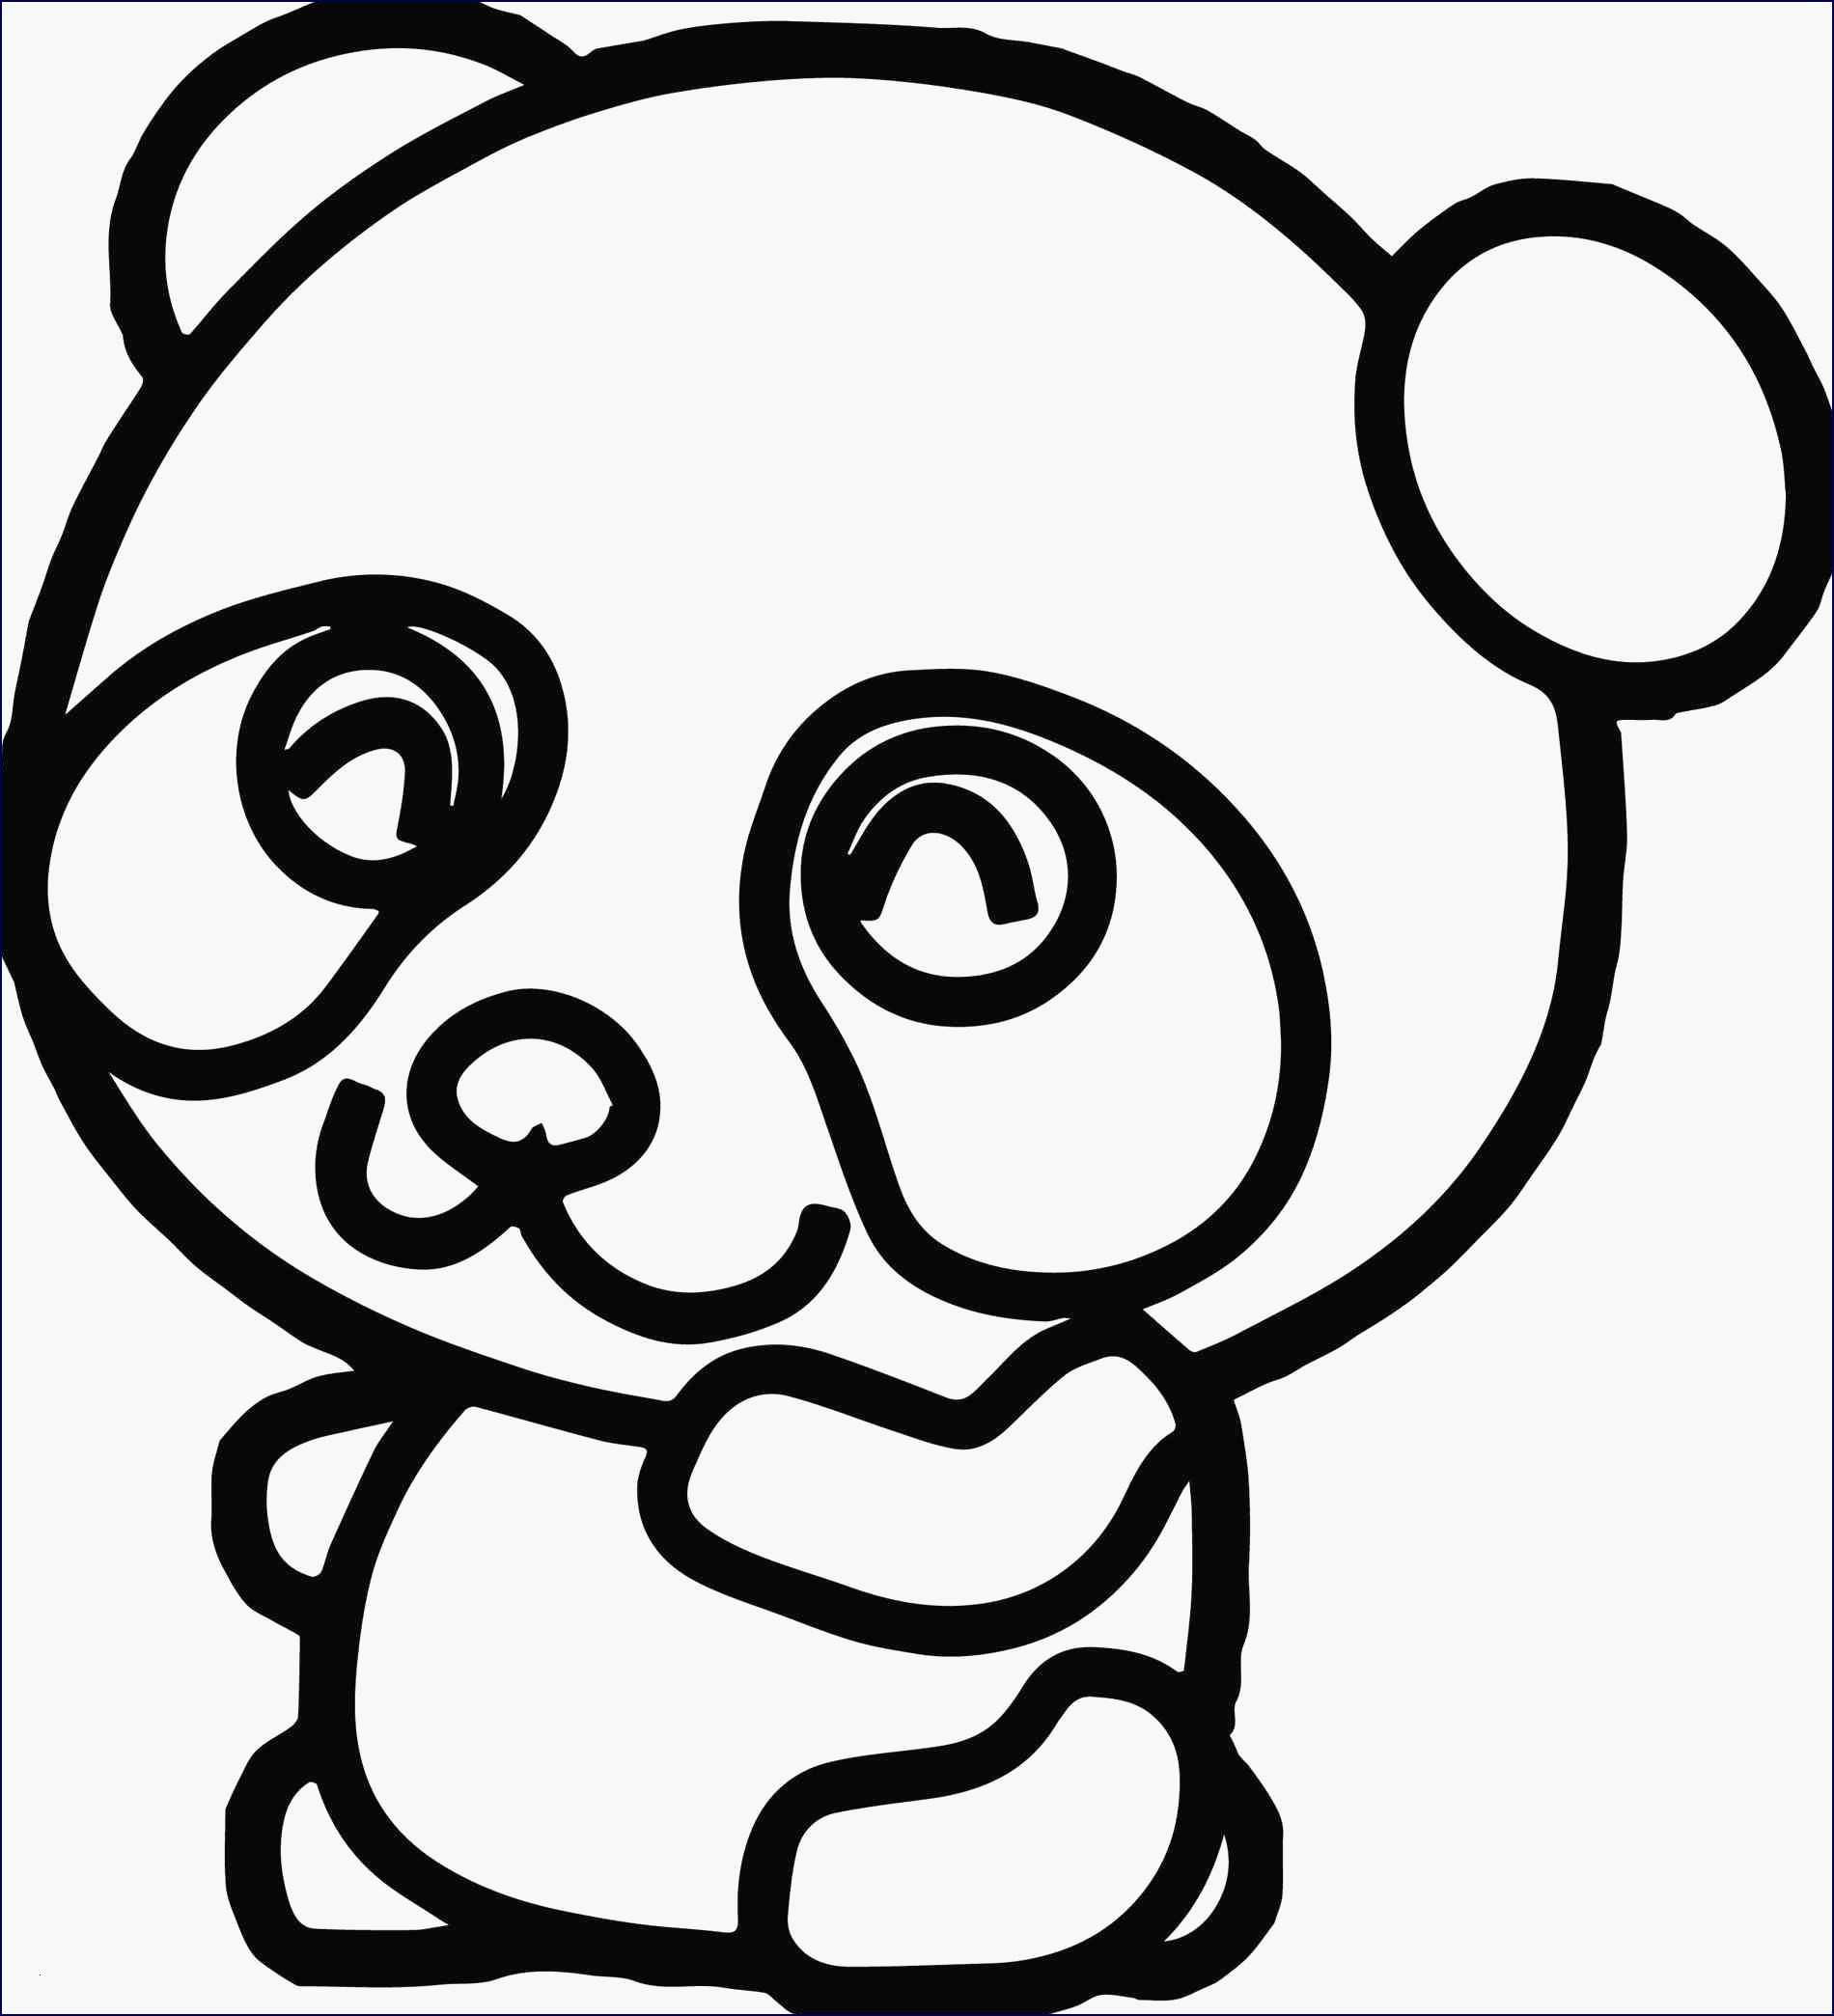 Kung Fu Panda Ausmalbilder Einzigartig Kung Fu Panda Coloring Pages Luxury 27 Kung Fu Panda Coloring Pages Fotografieren